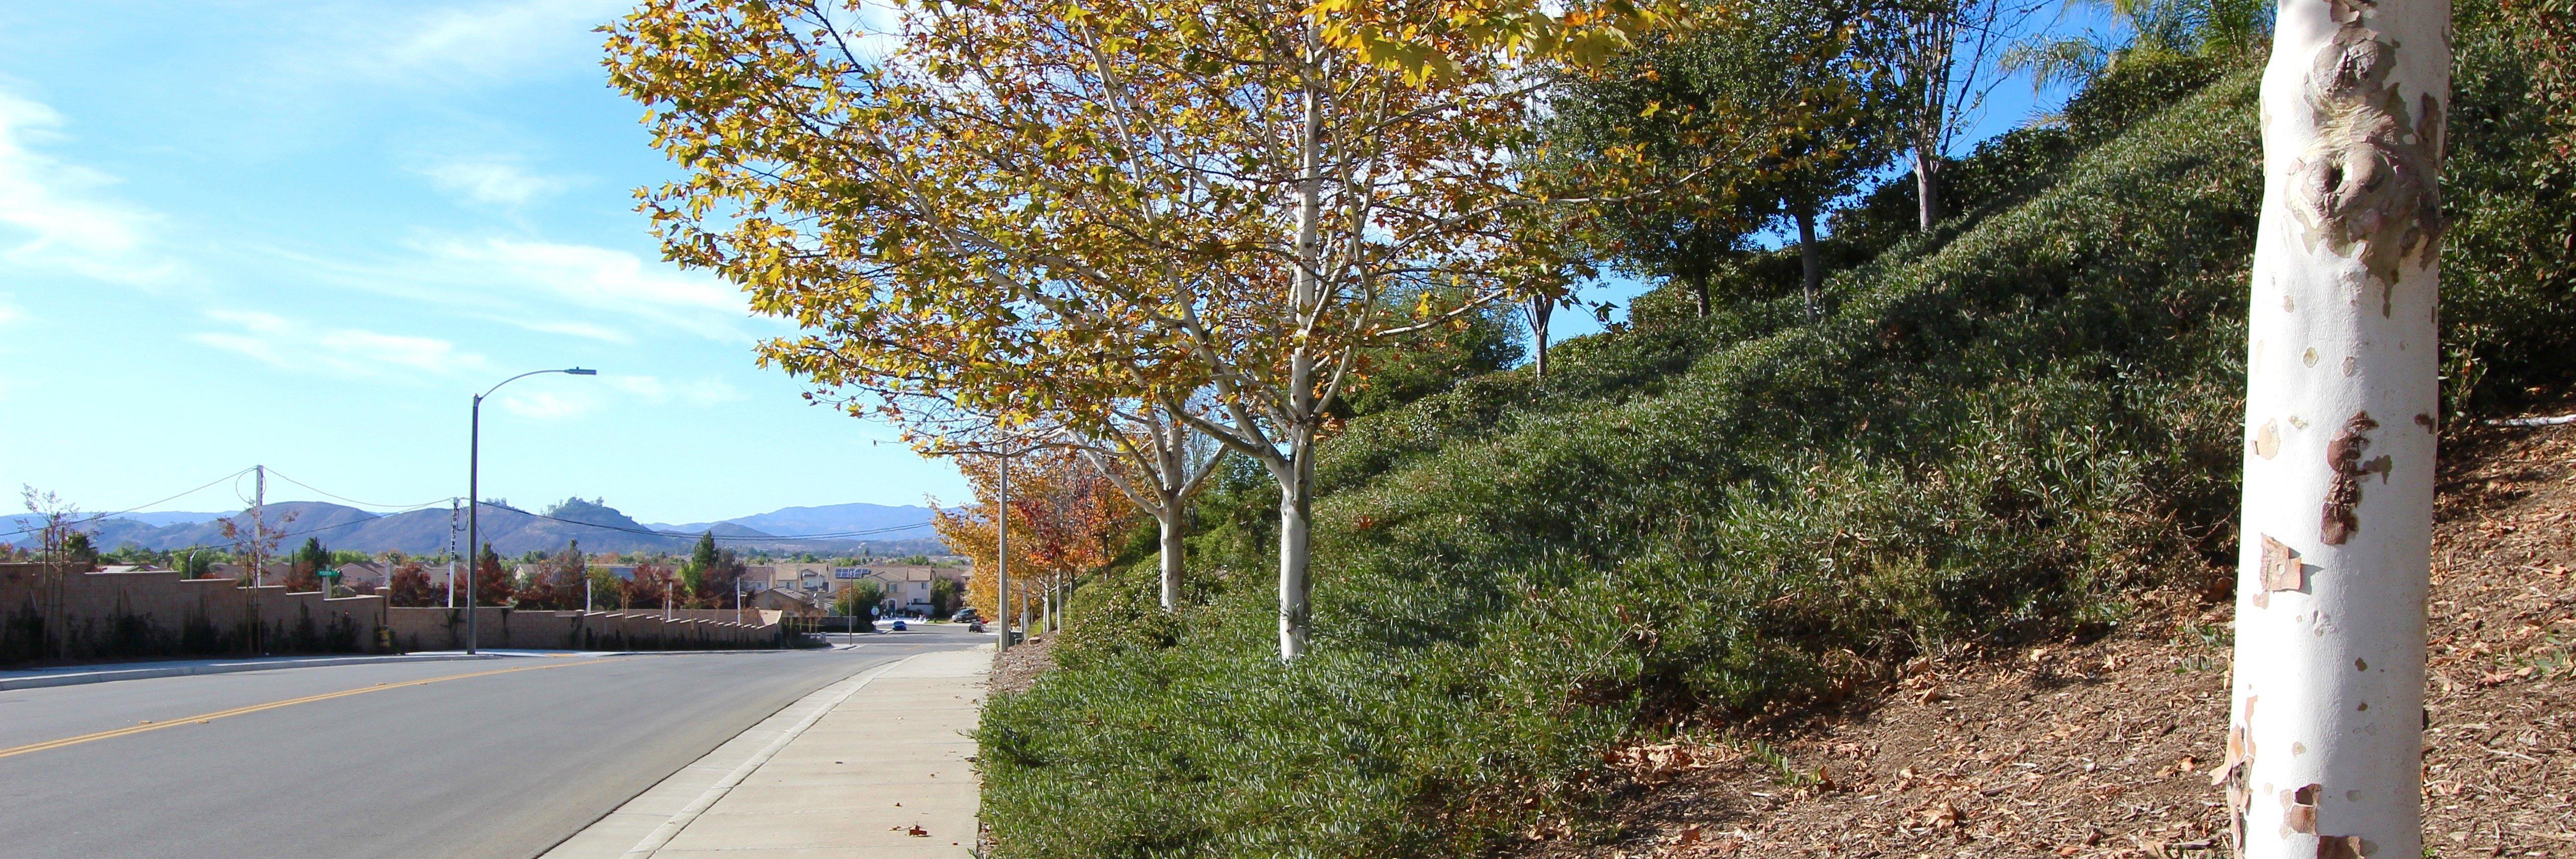 Summit Ridge is a community located in Winchester California